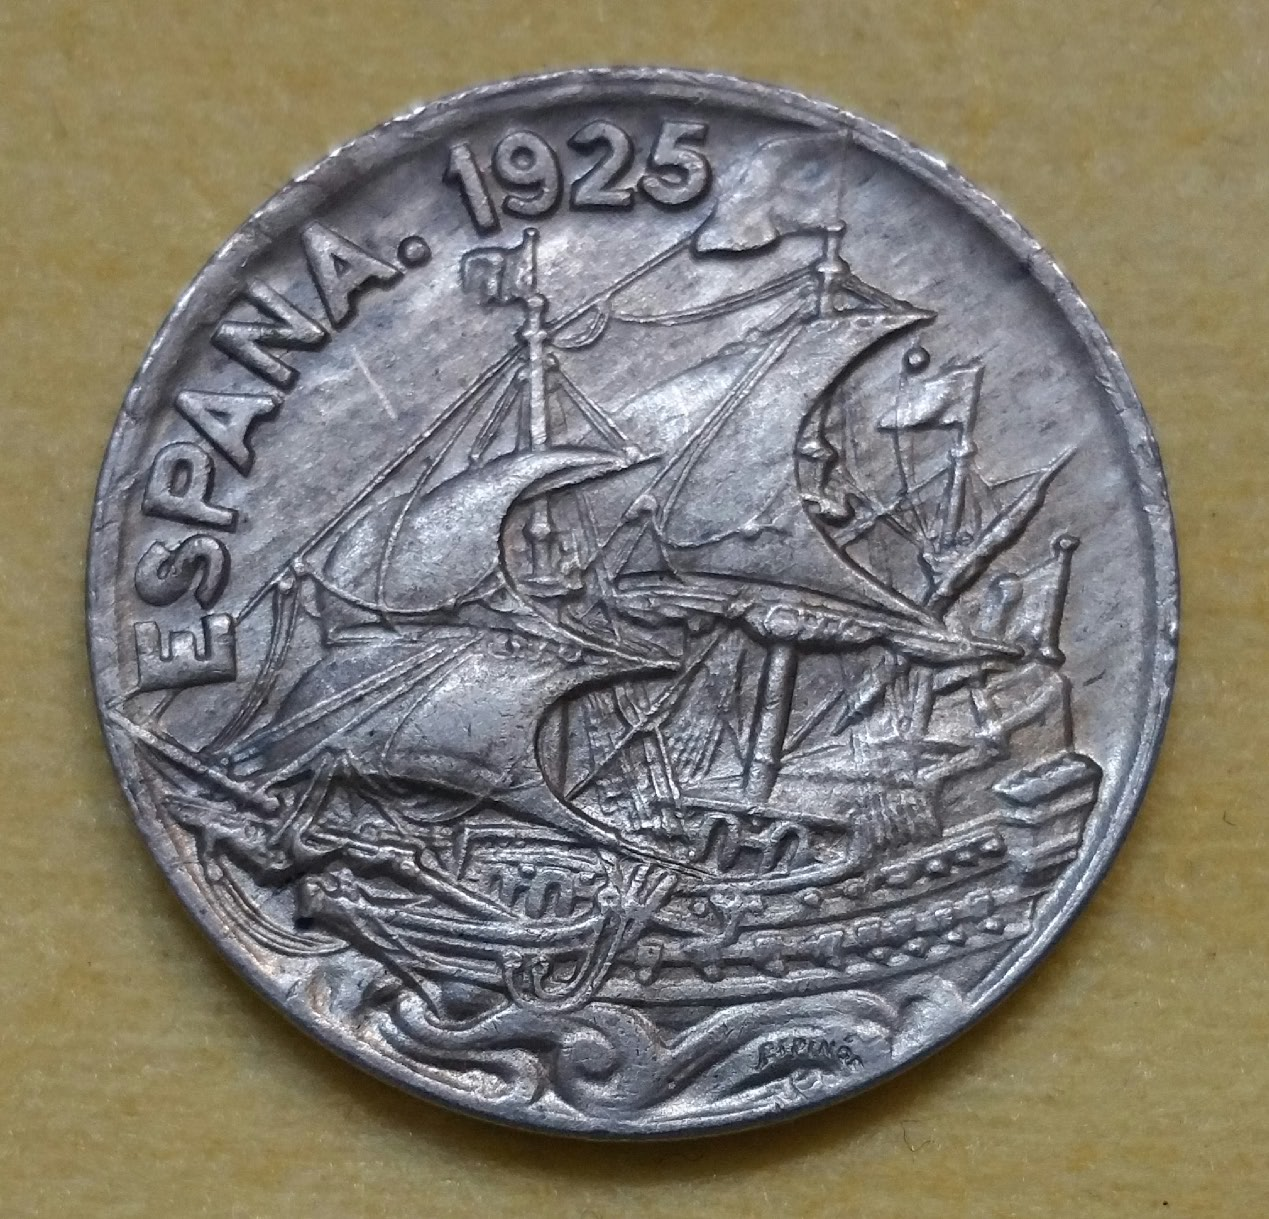 1925 - Serie completa 25 céntimos 1925, 1927, 1934 y 1937. Fbyiip